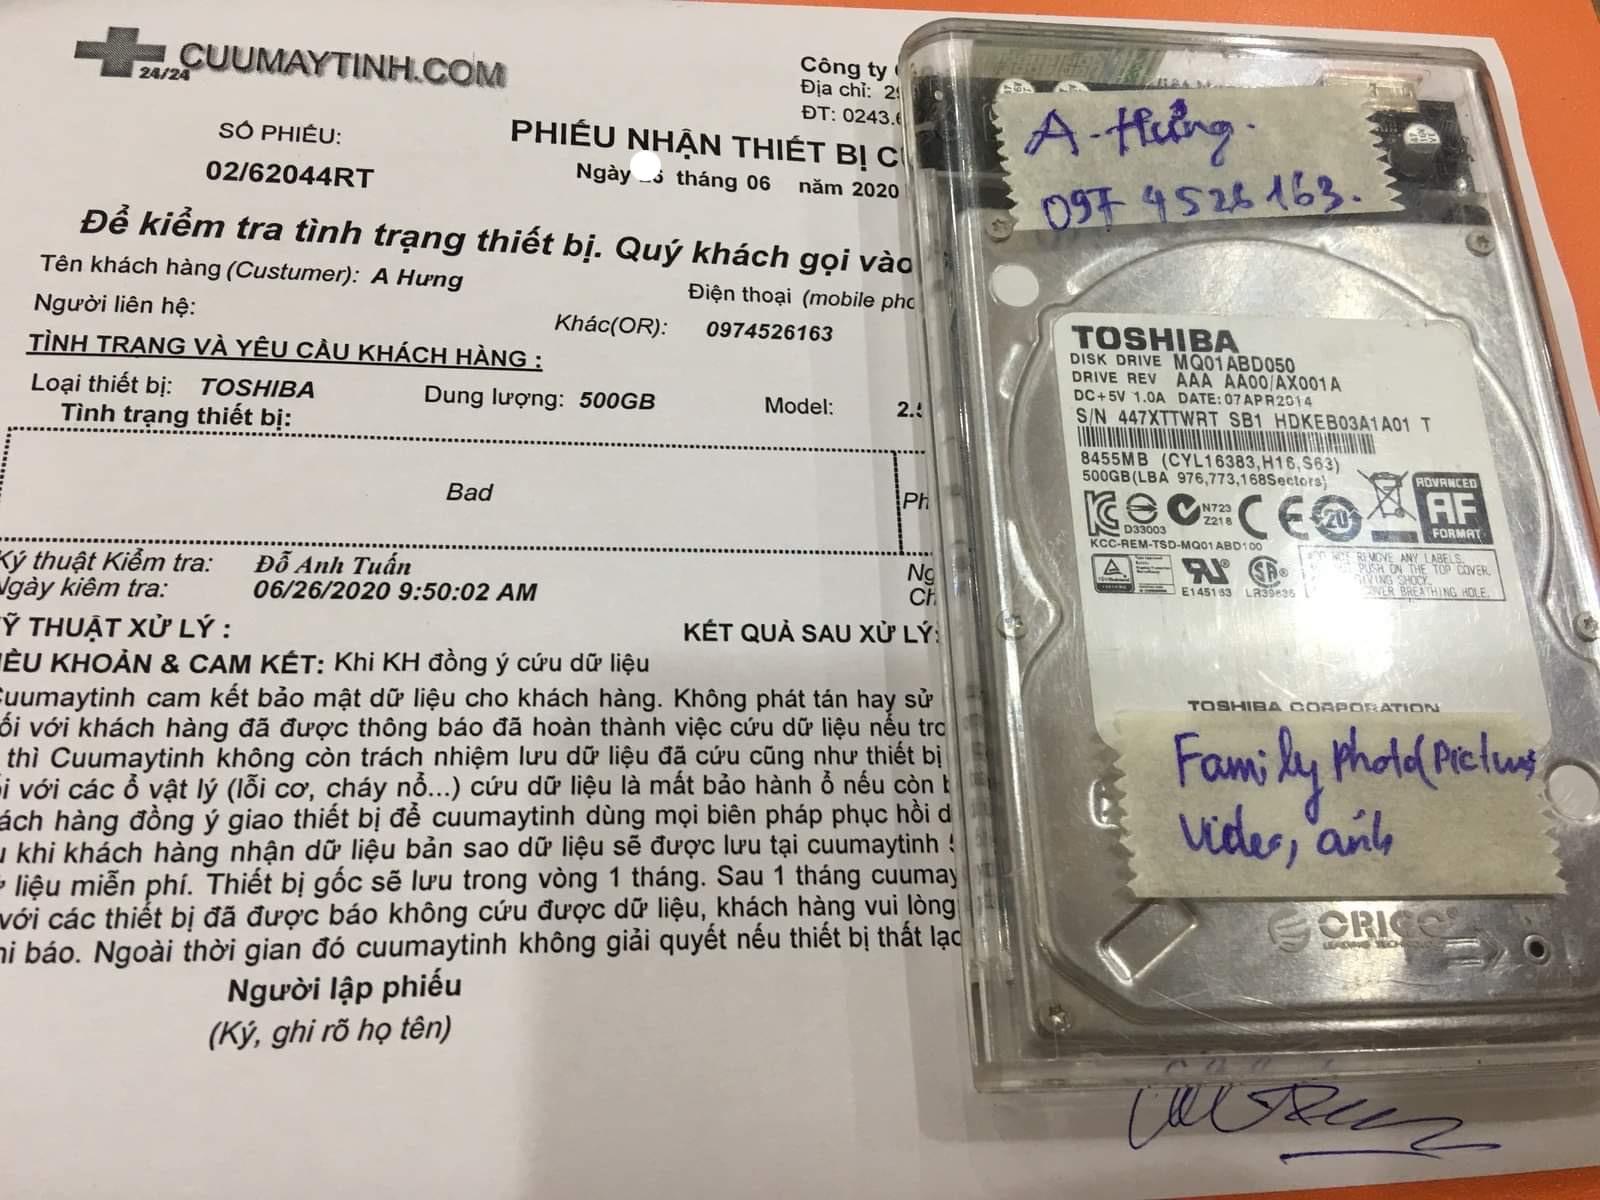 Lấy dữ liệu ổ cứng Toshiba 500GB bad 29/06/2020 - cuumaytinh